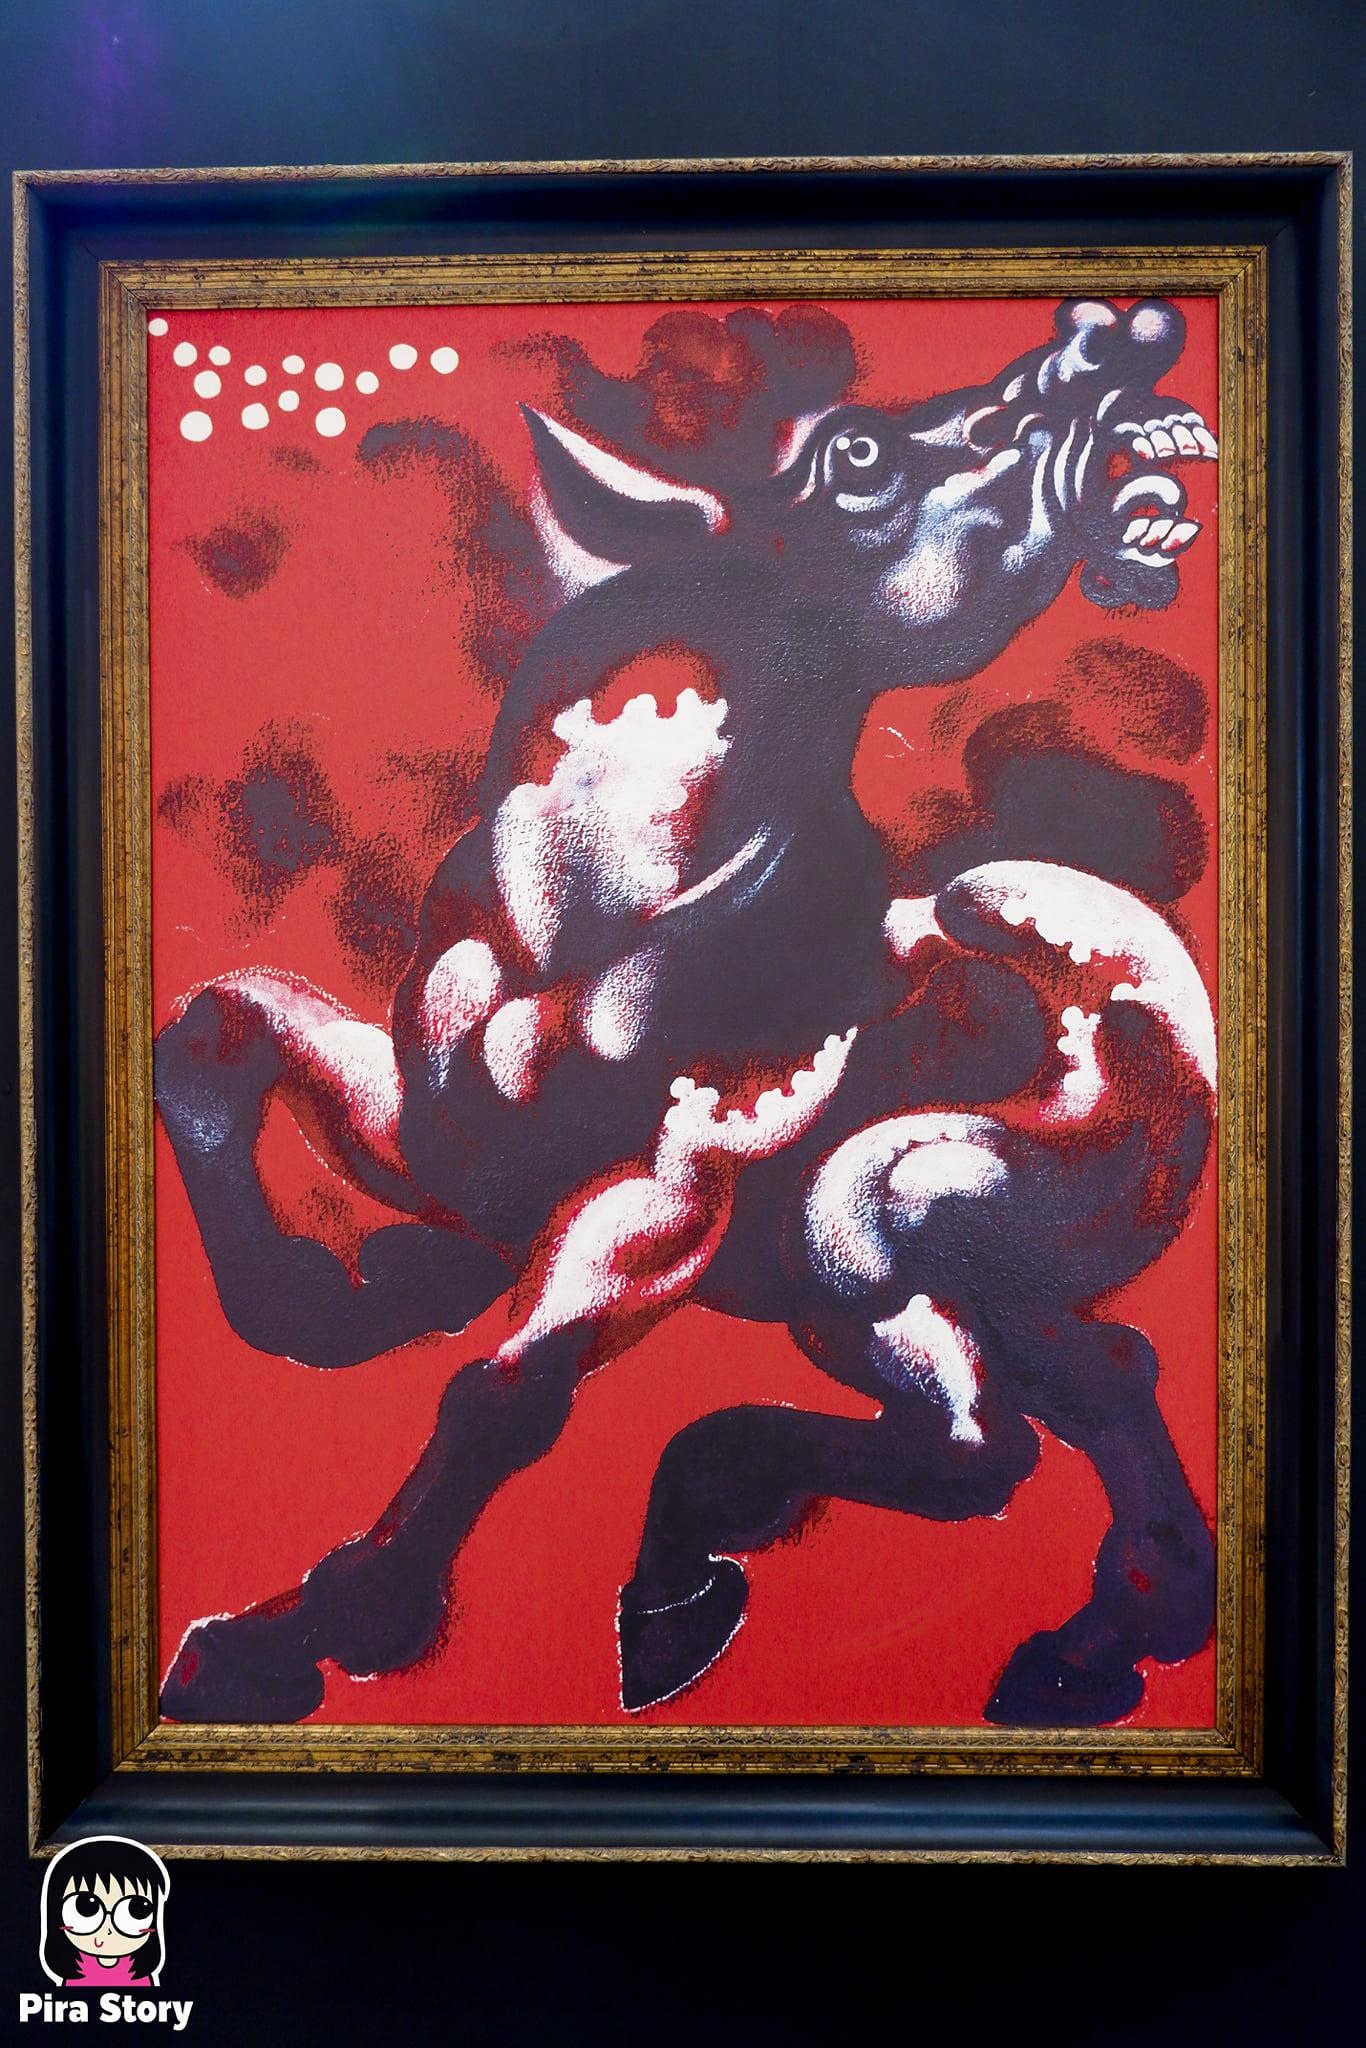 Immersive Art of Thawan Duchanee งานศิลปะ ถวัลย์ ดัชนี ไอคอนสยาม iconsiam นิทรรศการ AR ightning of the Soul โดม 360 องศา Immersive 360 Fulldome